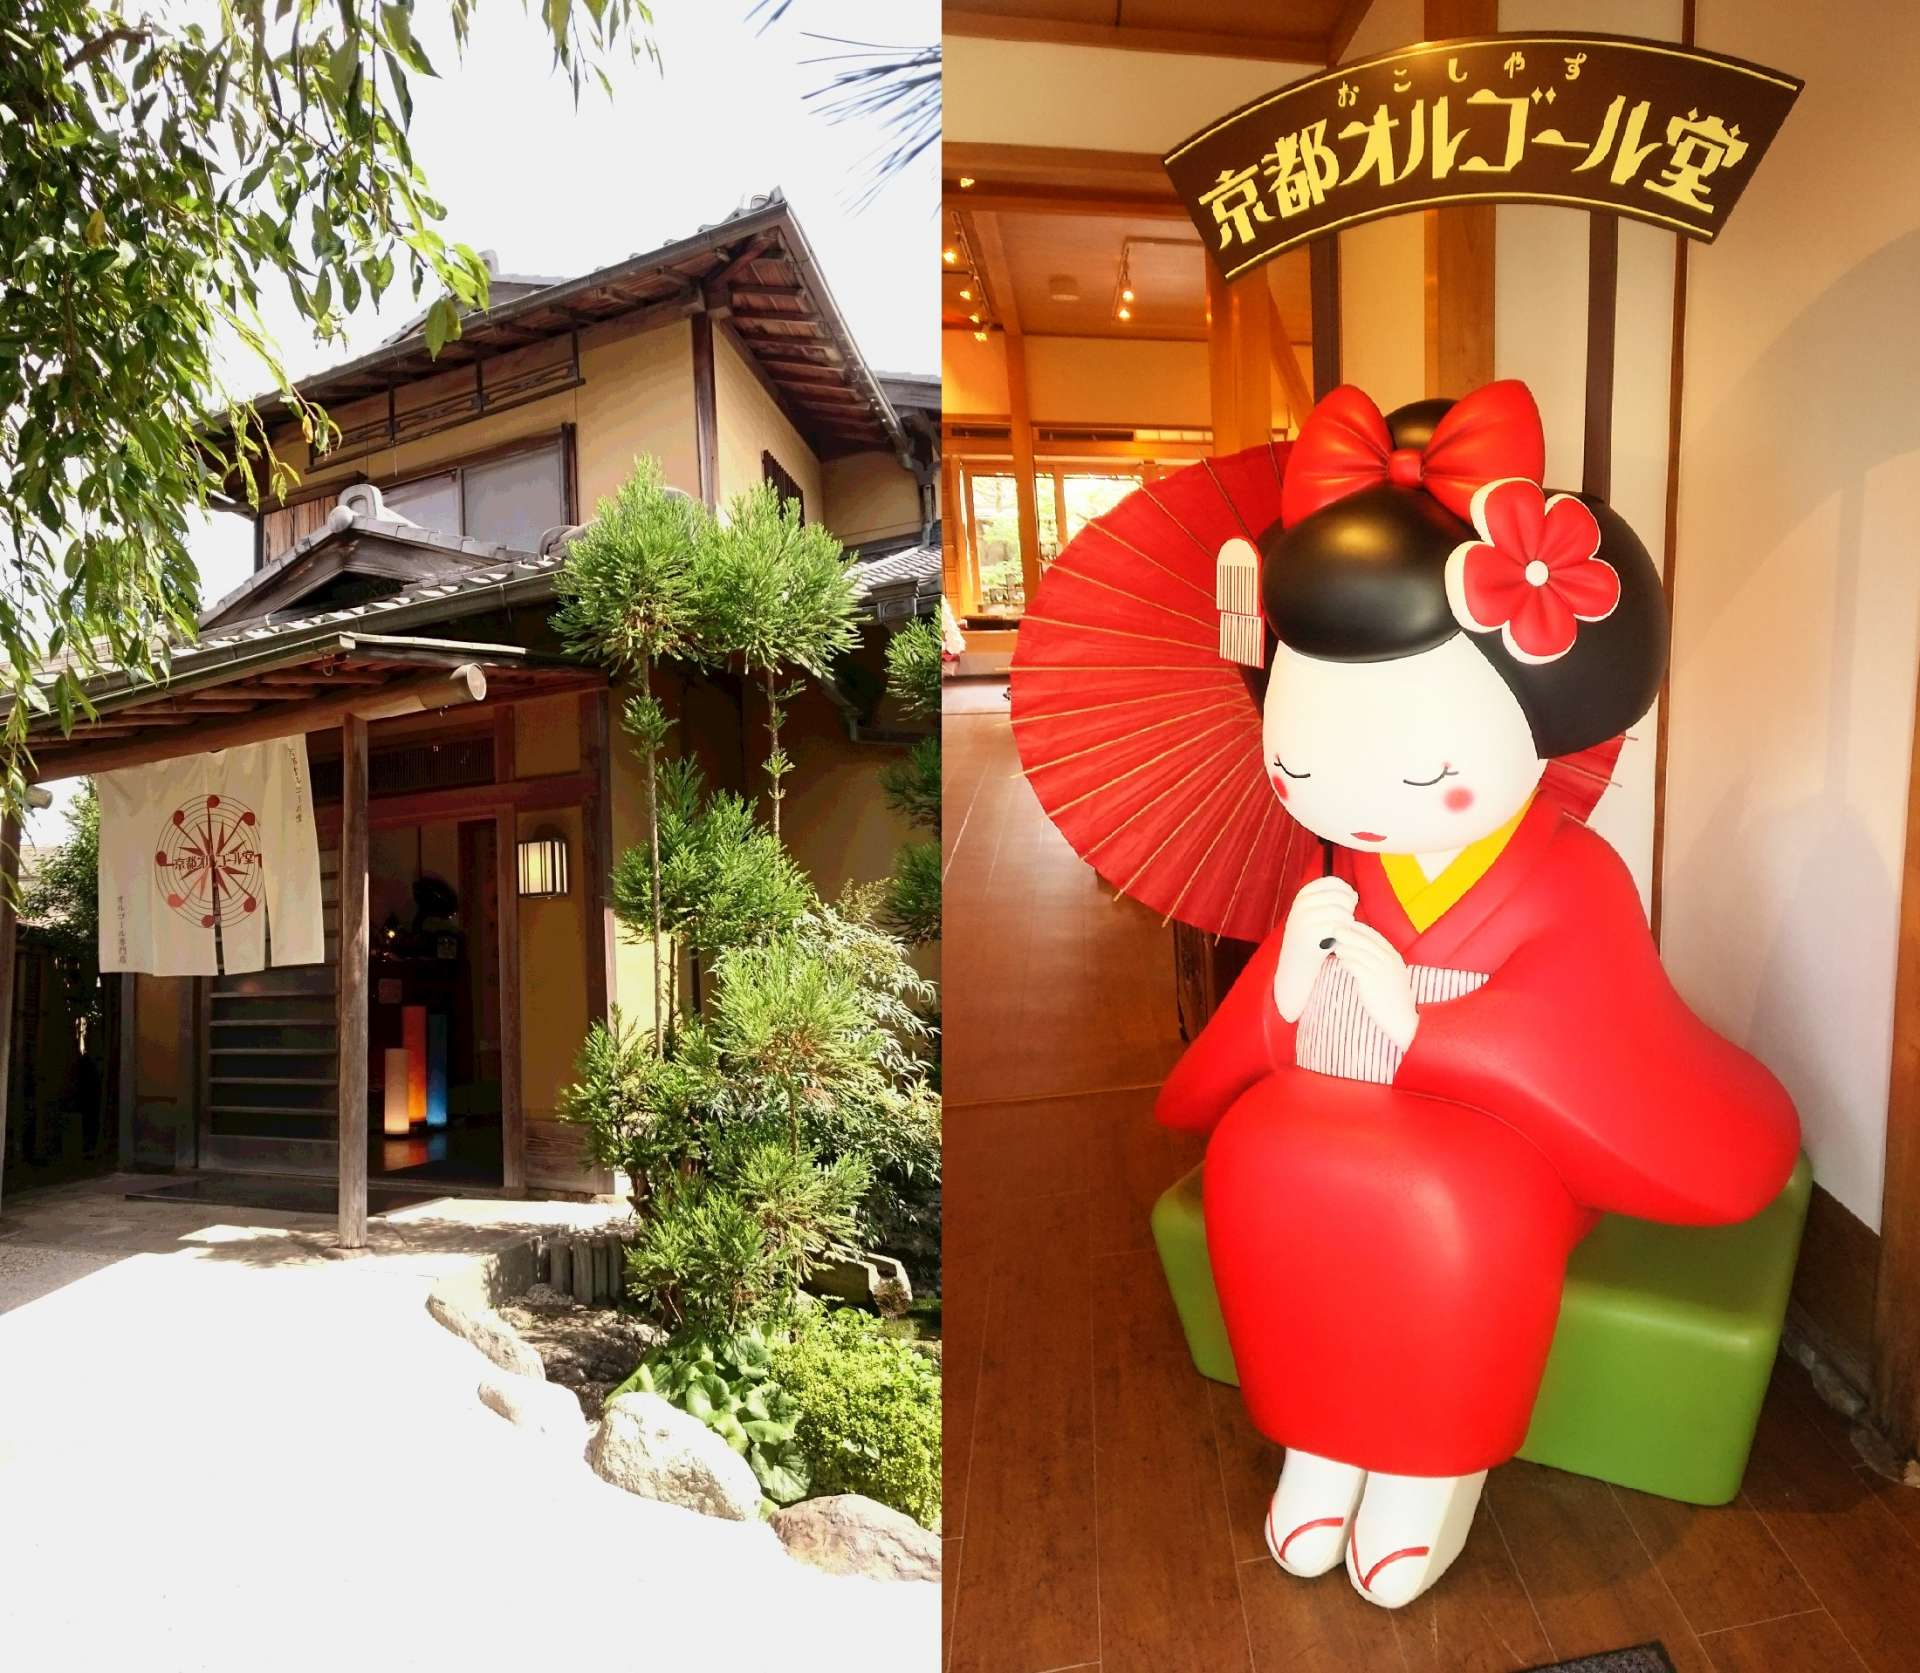 Kyoto Music Box Museum, Saga